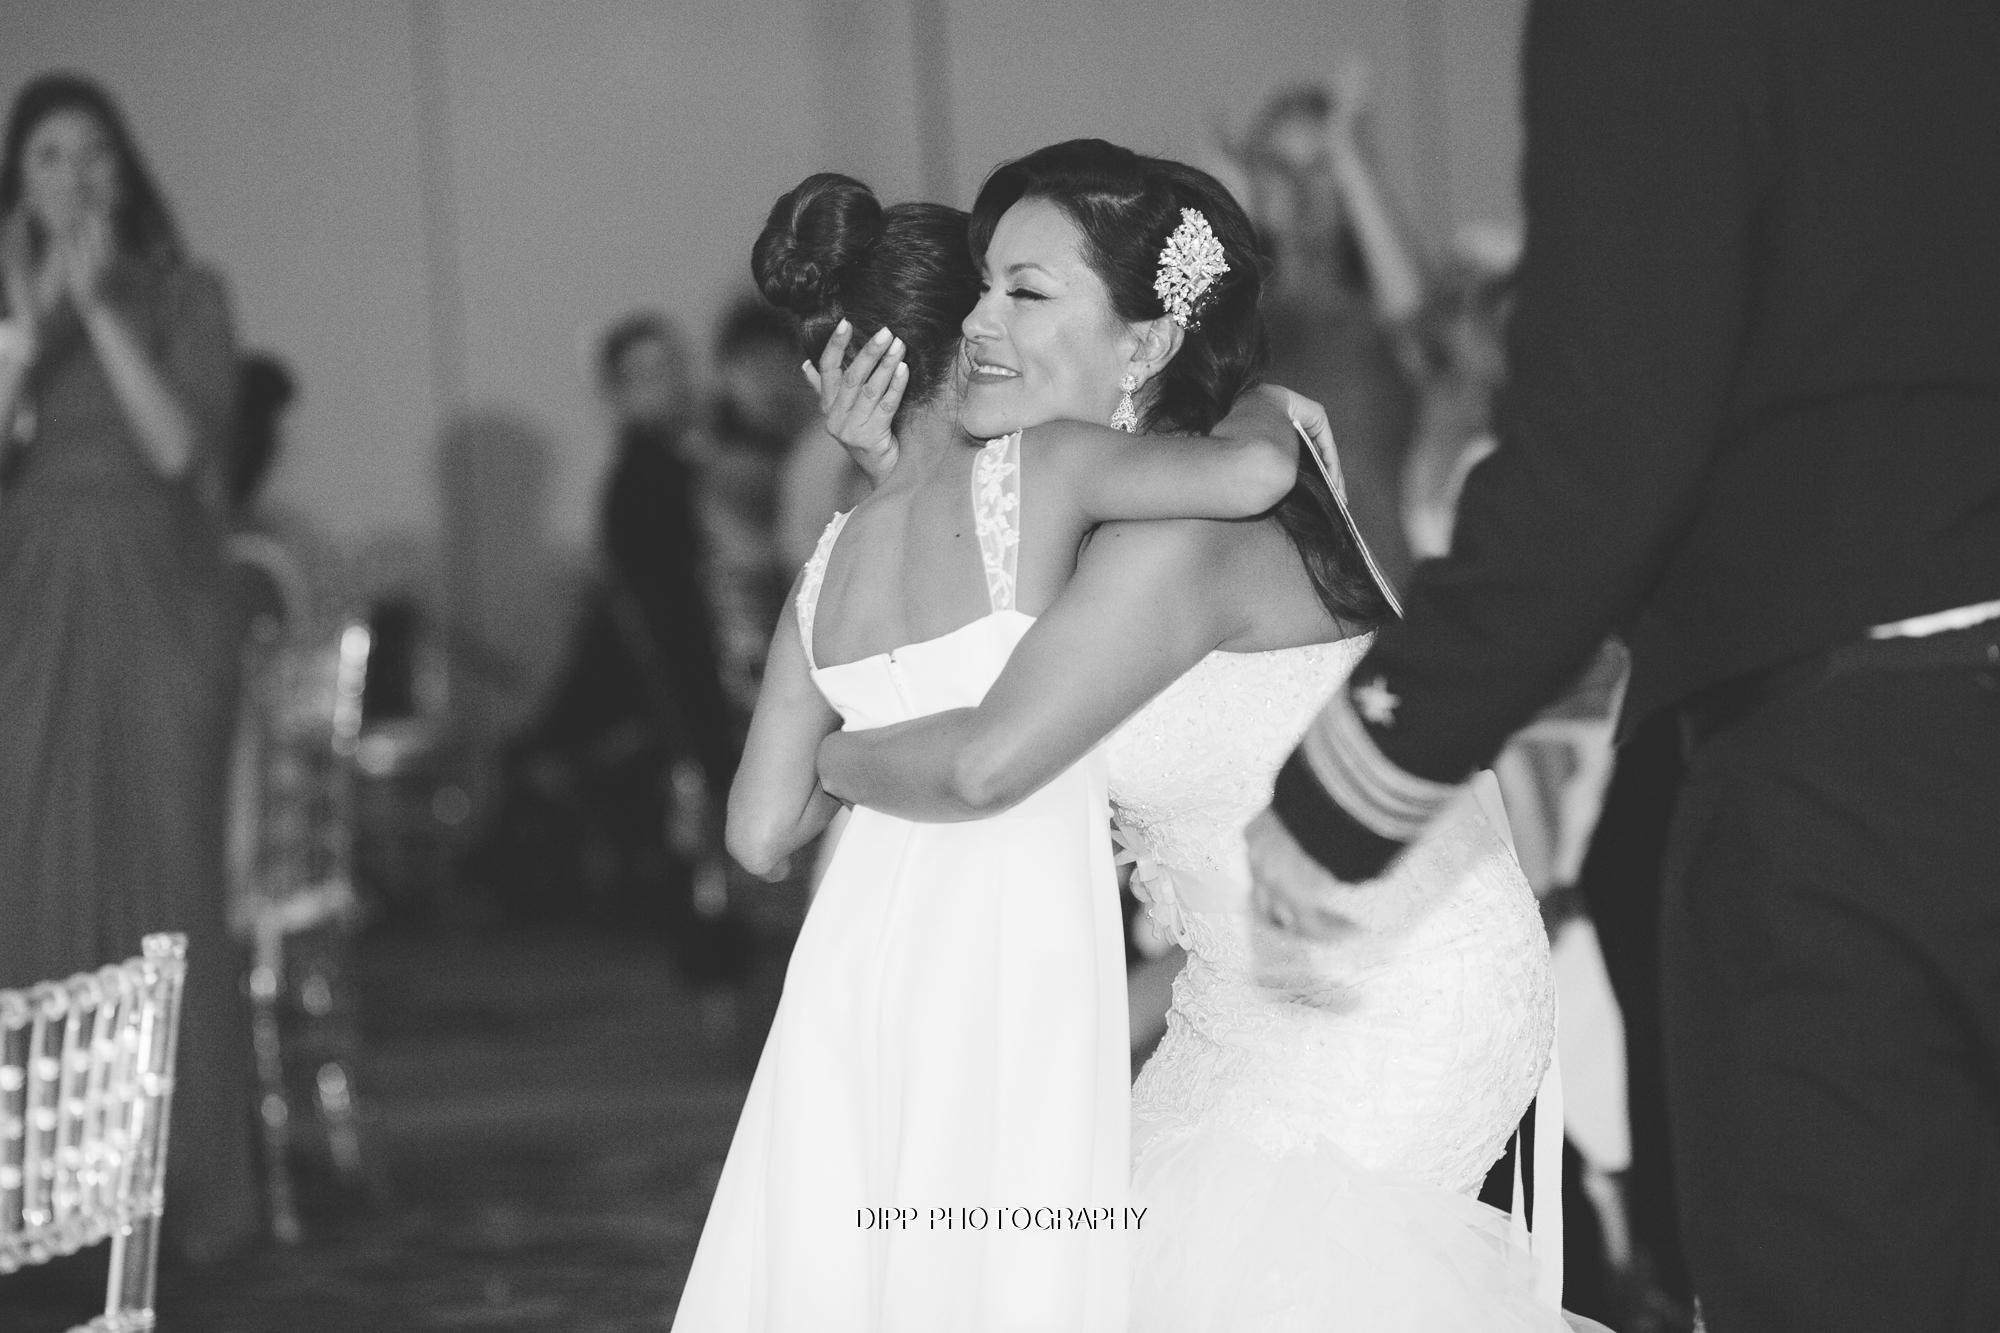 Dipp_2016 EDITED Sara & Brandon Wedding-538